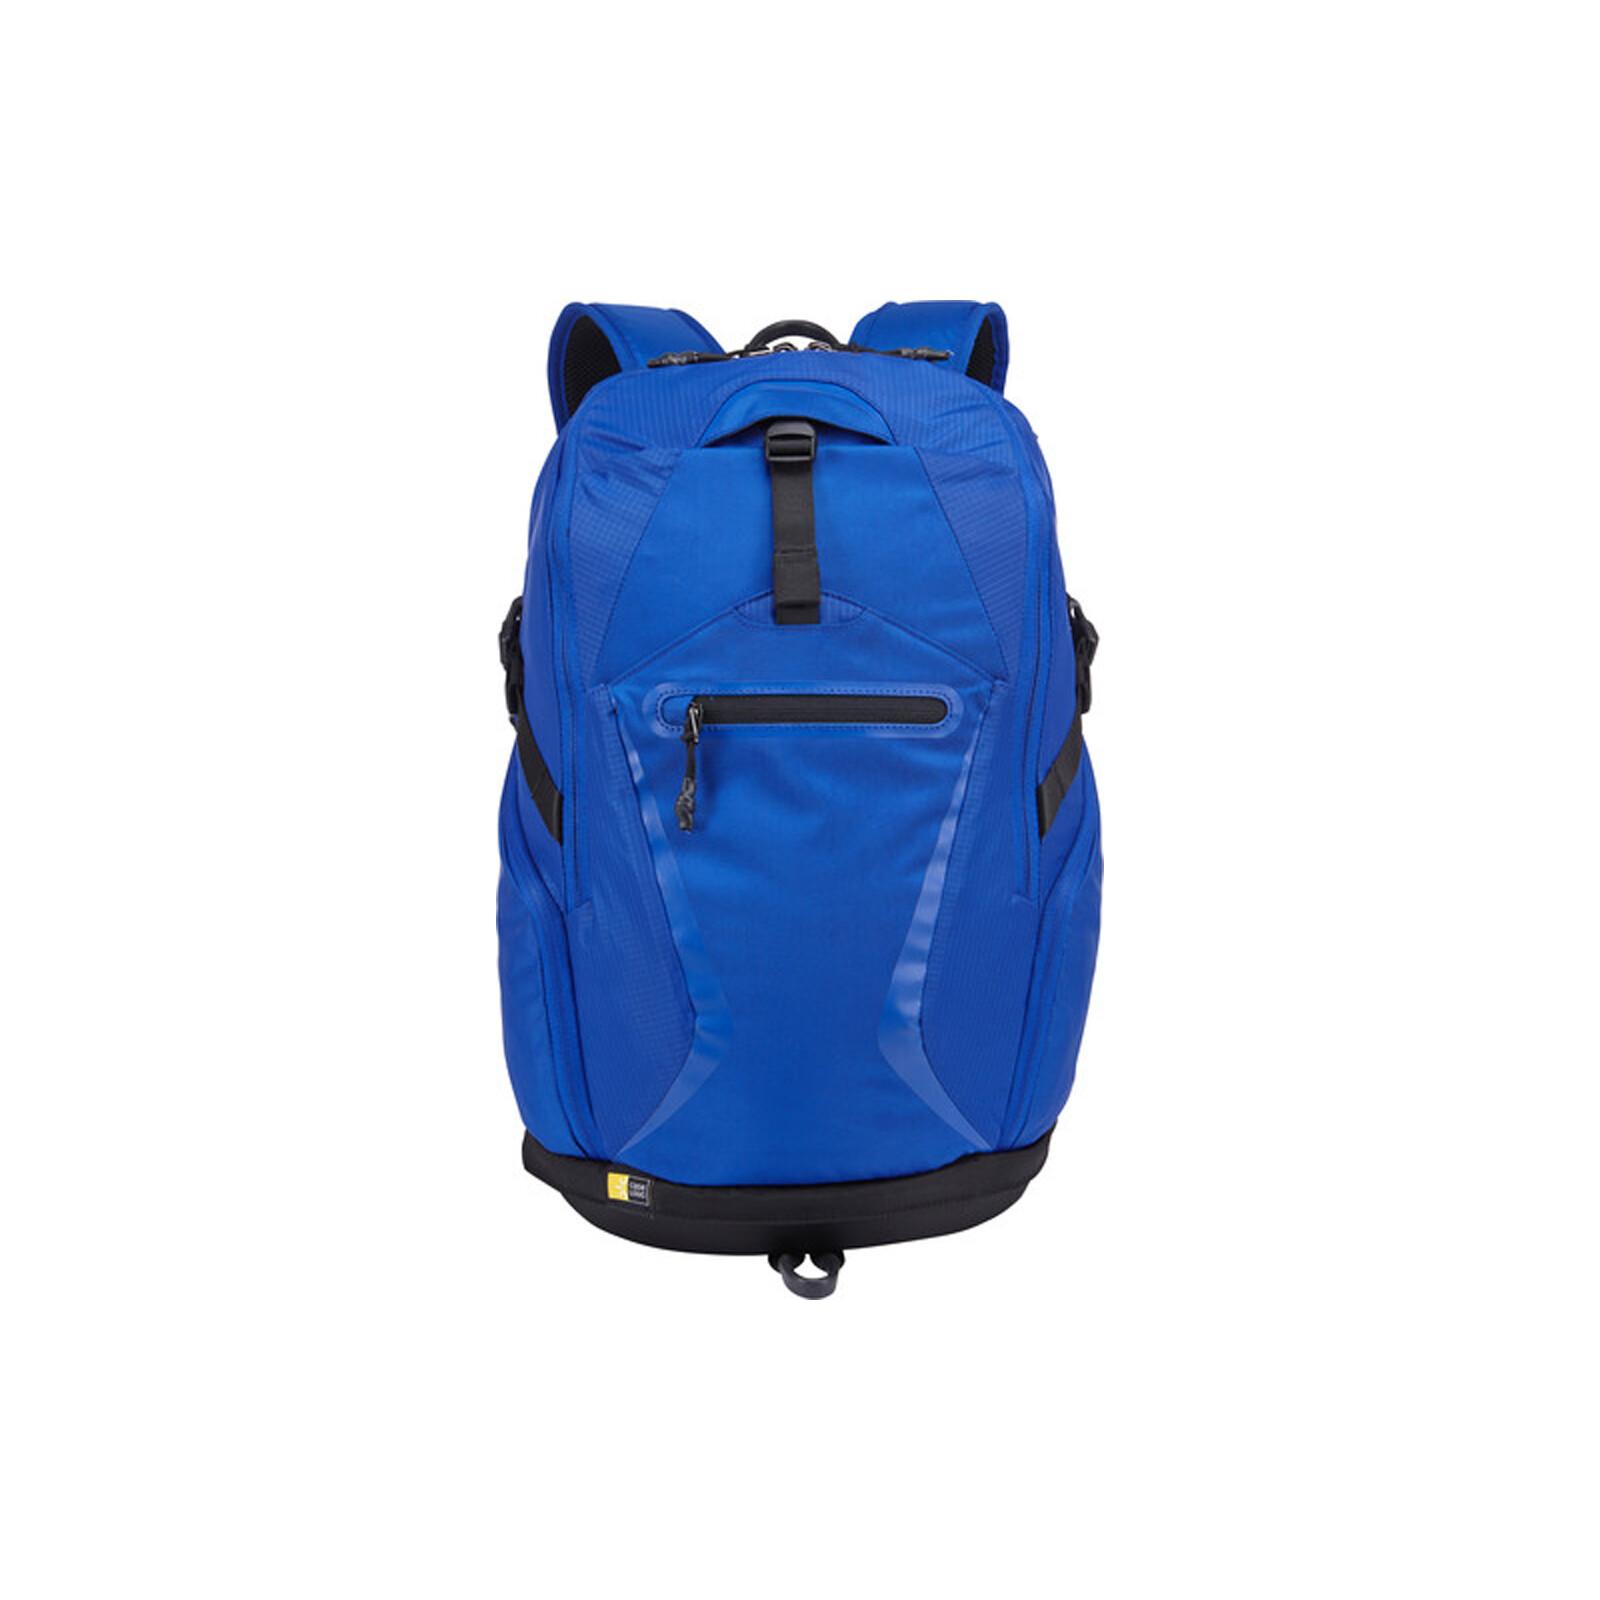 "CaseLogic Griffith Park 15"" Backpack"